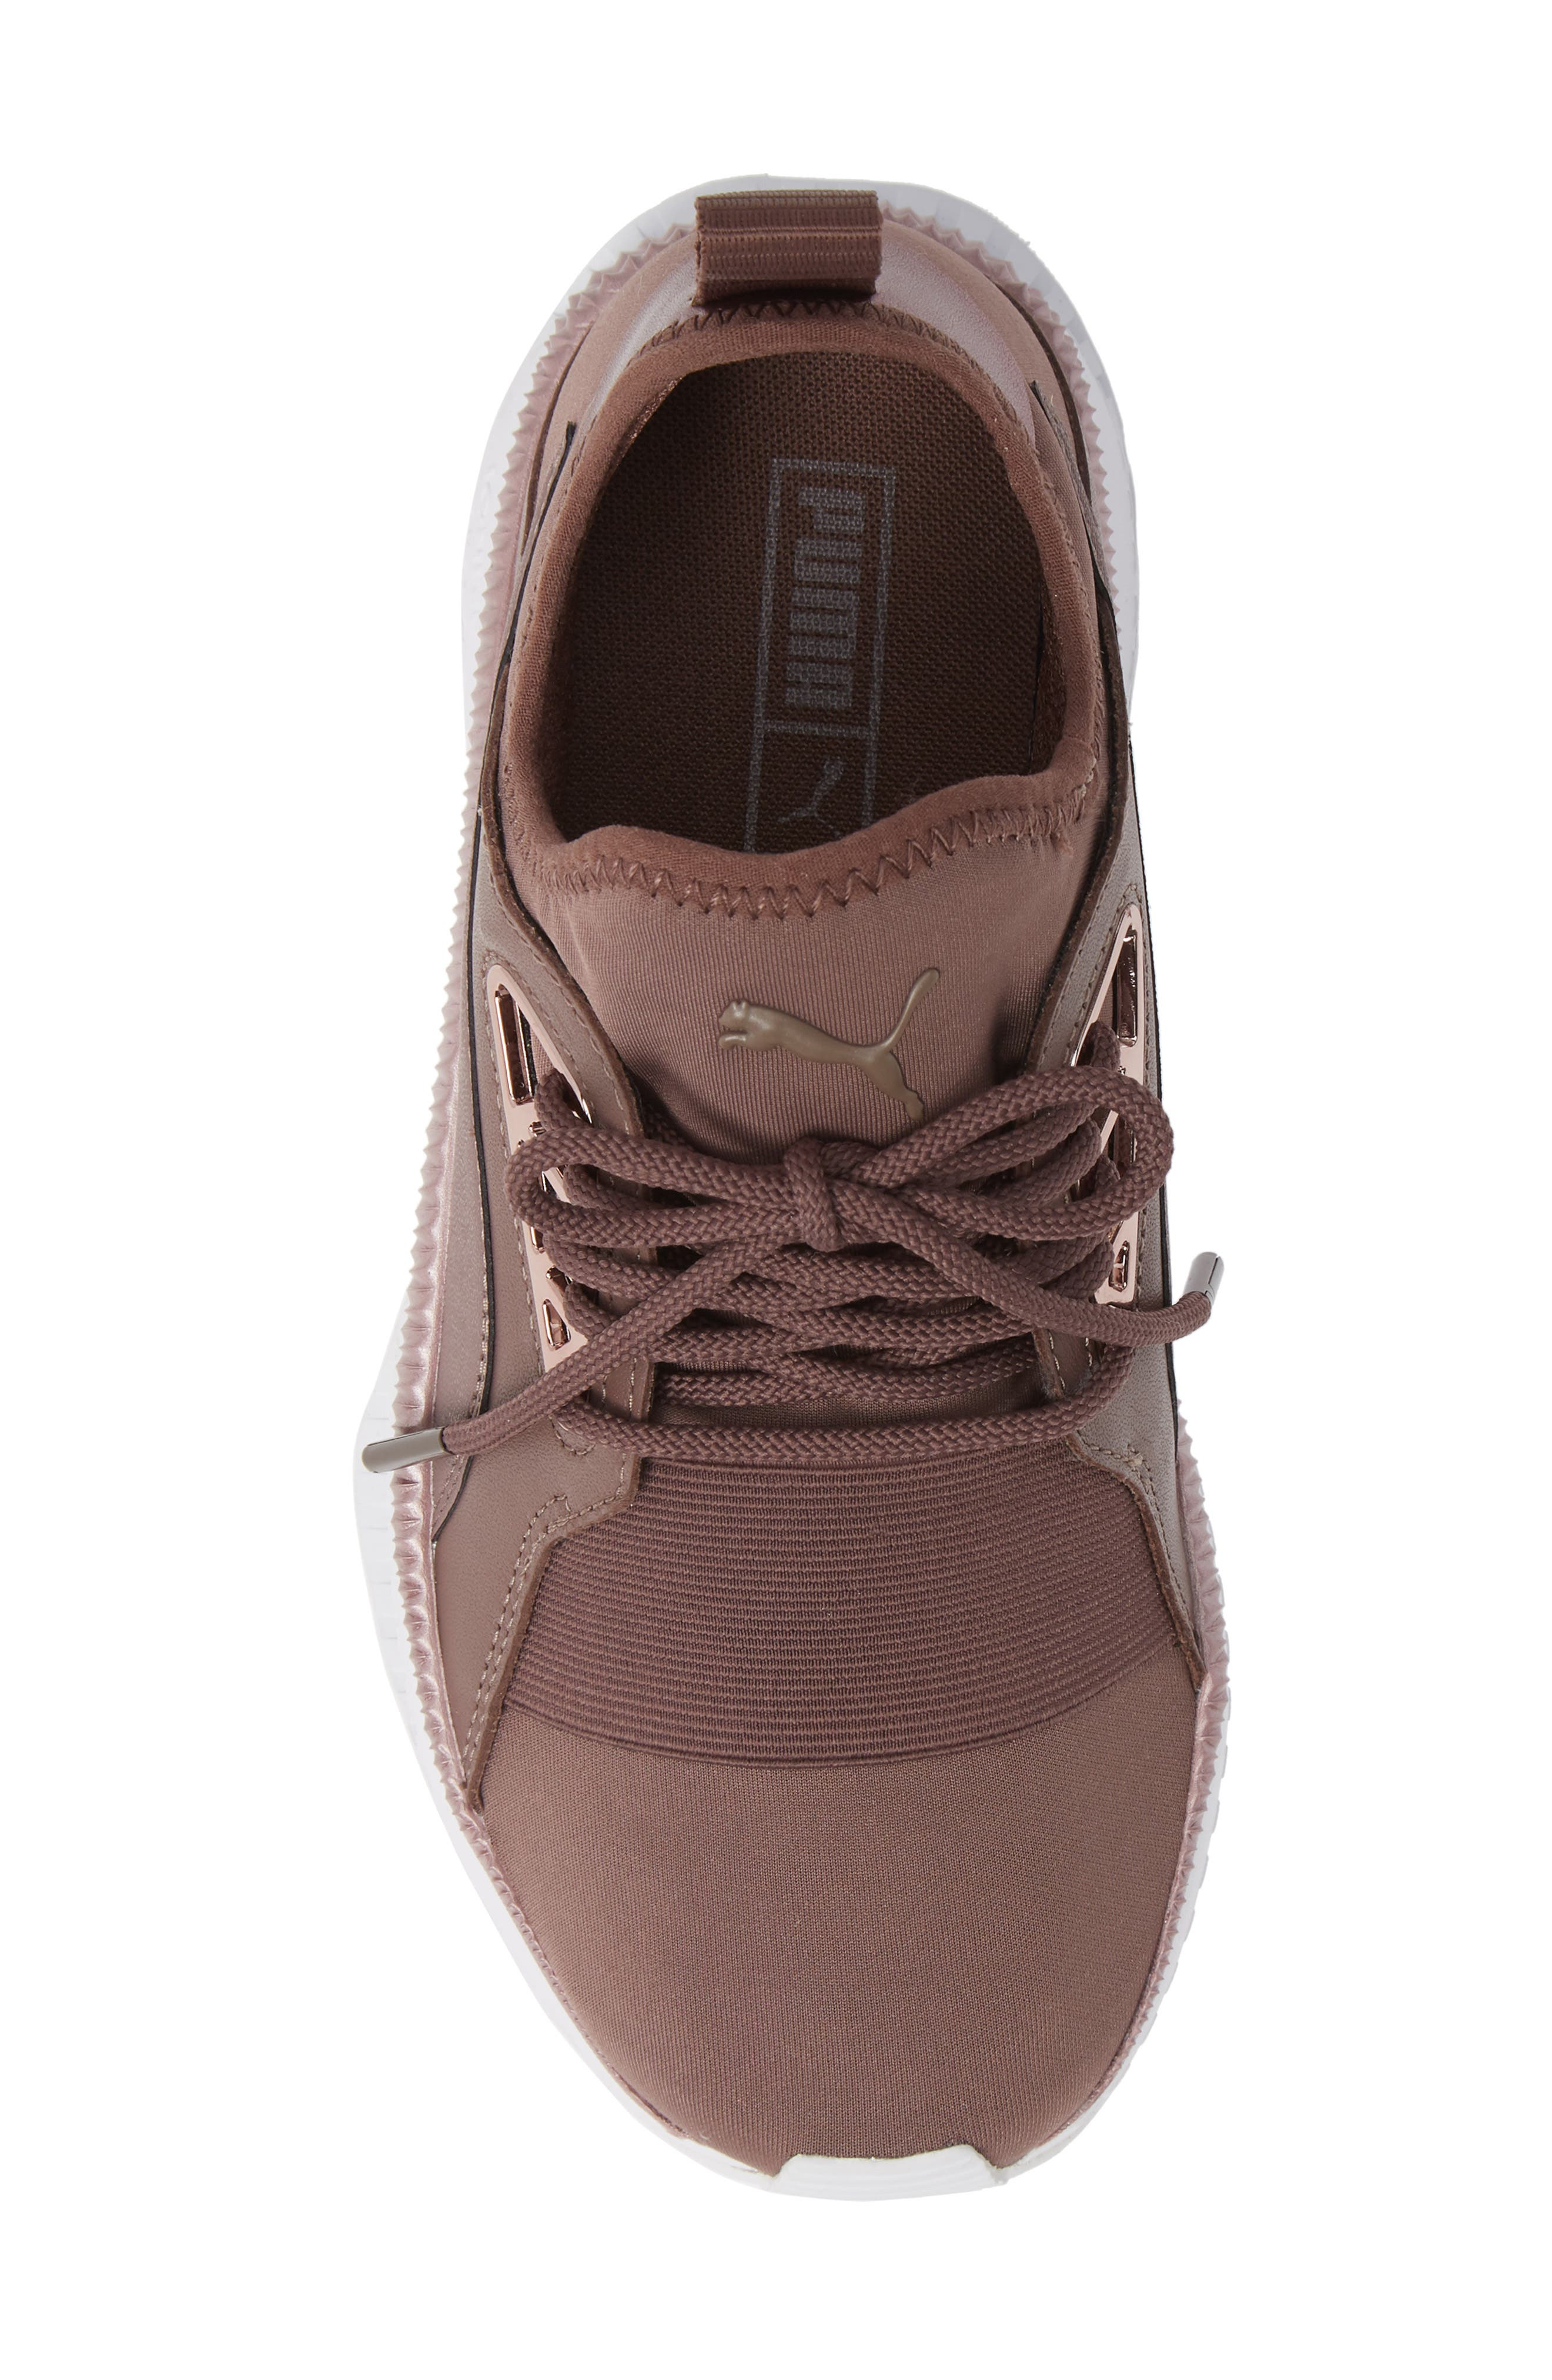 PUMA, TSUGI Apex Jewel Sneaker, Alternate thumbnail 5, color, PEPPERCORN/ PEPPERCORN